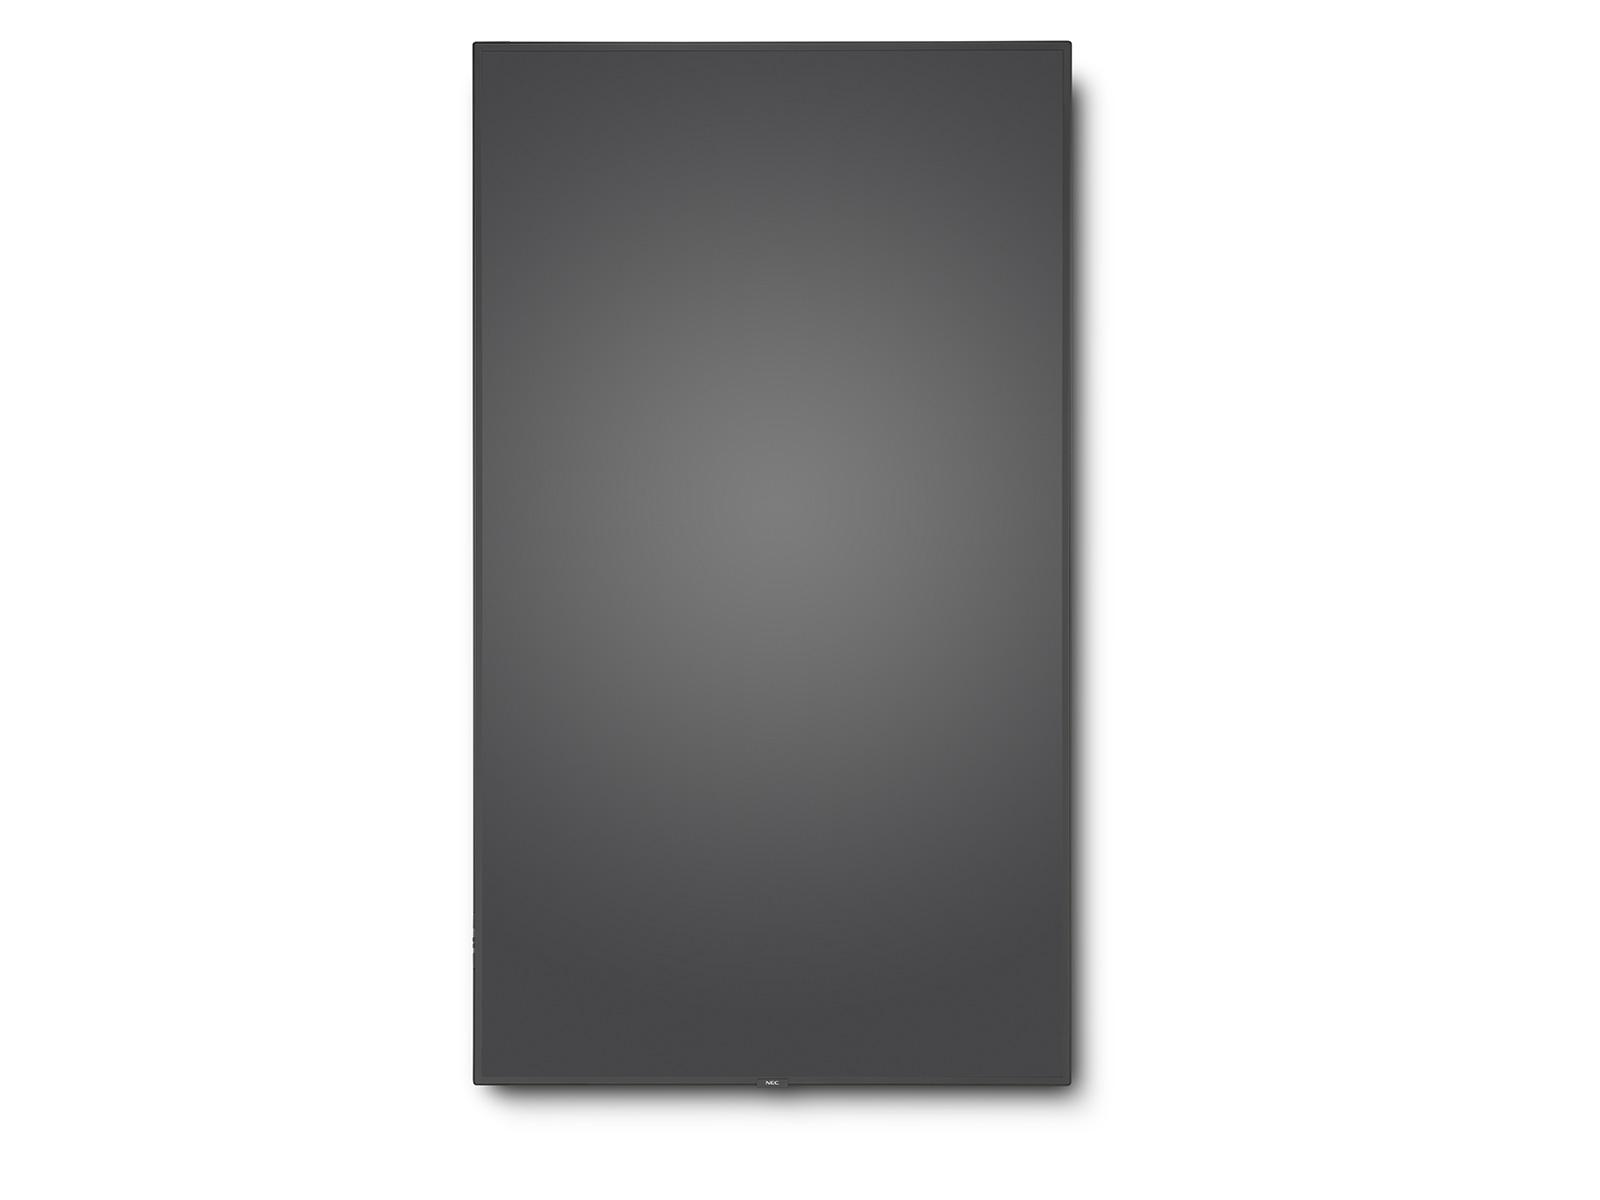 NEC_Vx54Q_HO_Port_Blank_1600x1200